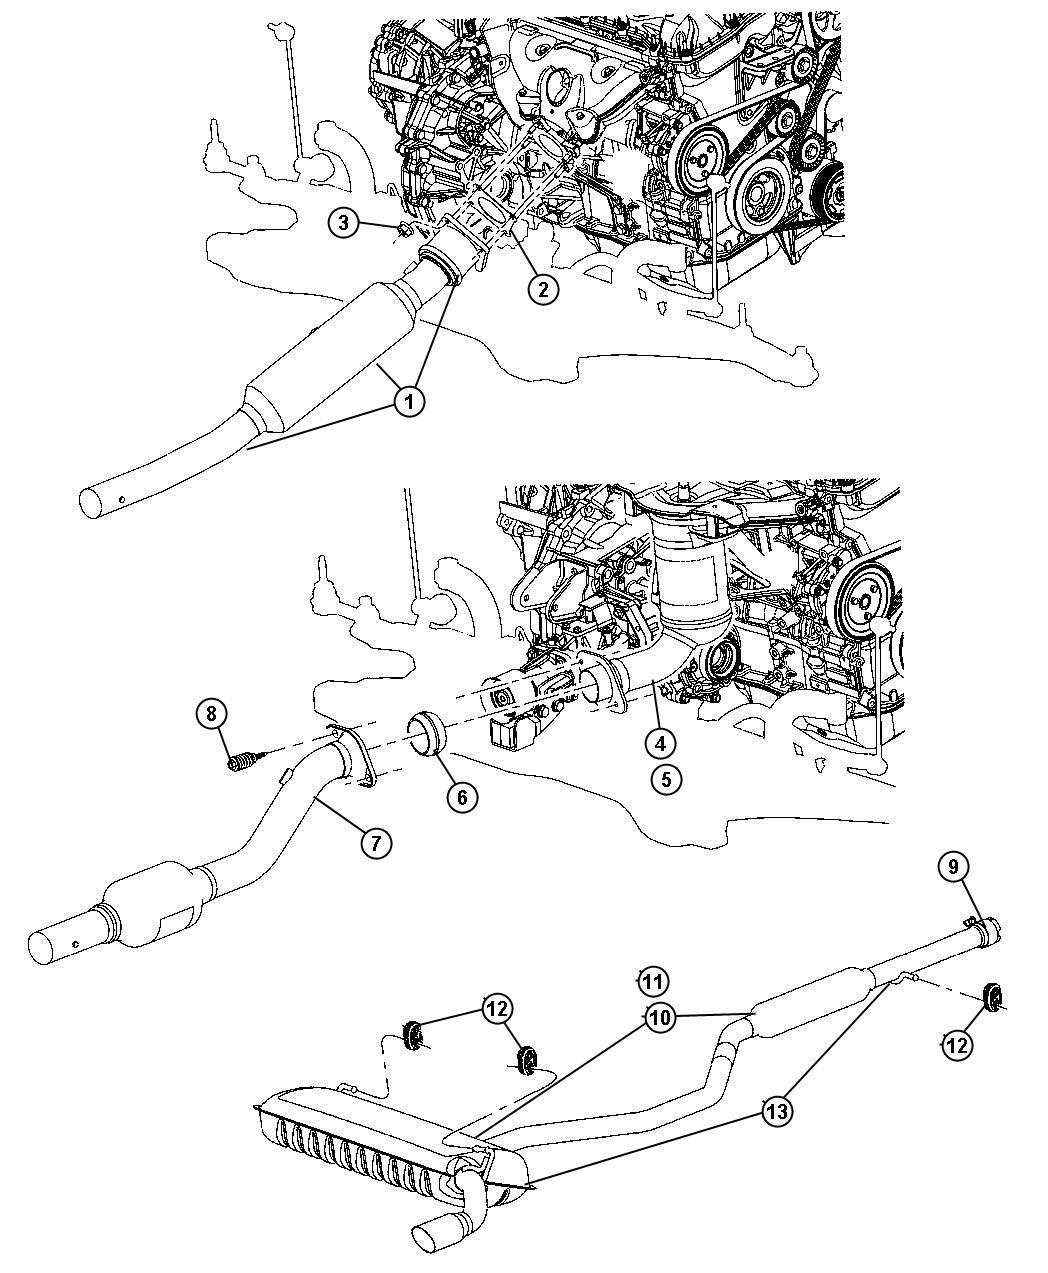 Exhaust System 1 8l 1 8l I4 Dohc 16v Dual Vvt Engine 2